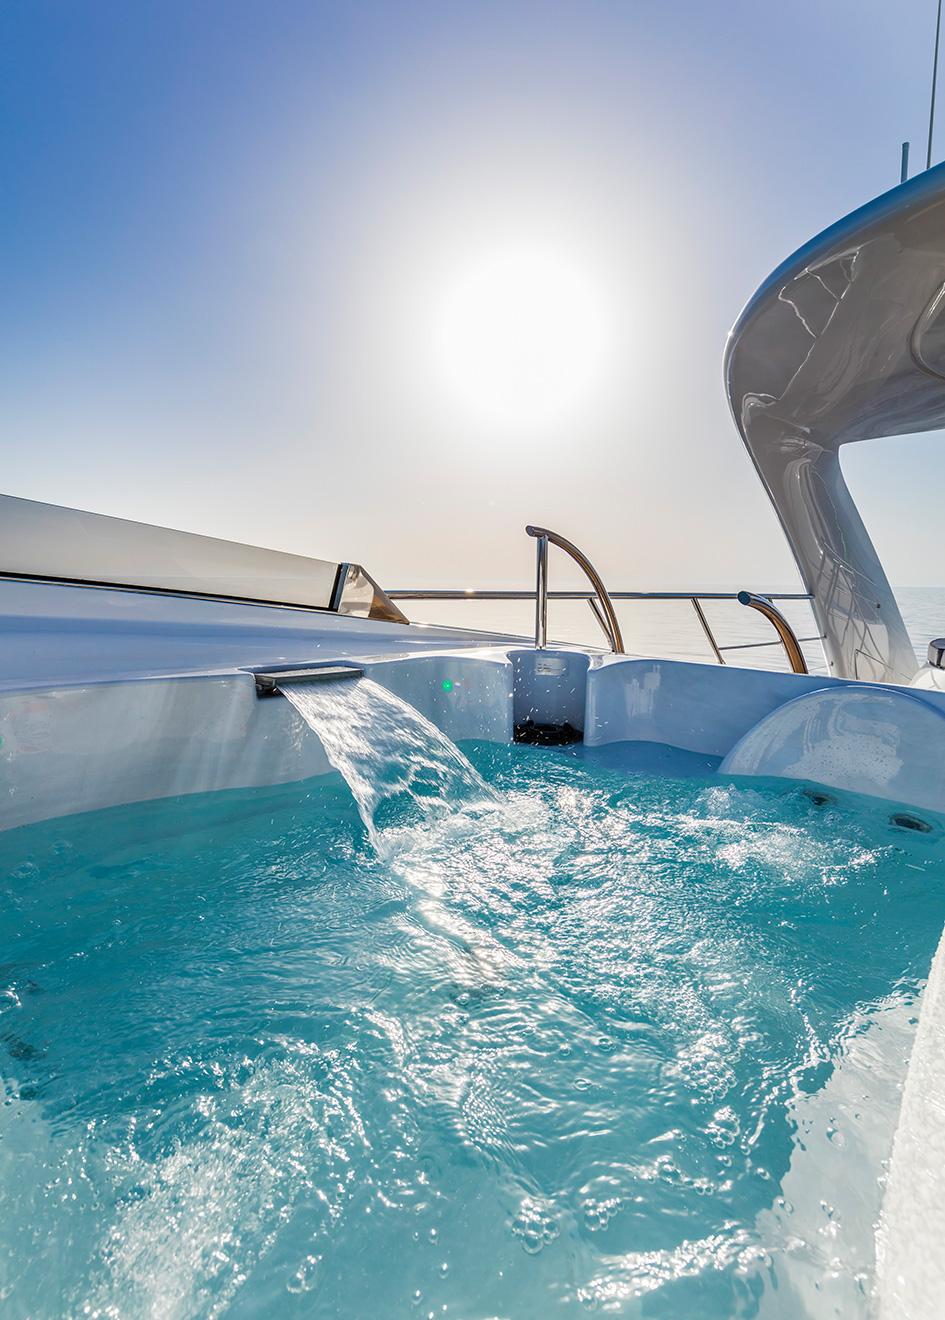 the-spa-pool-of-the-isa-120-yacht-clorinda